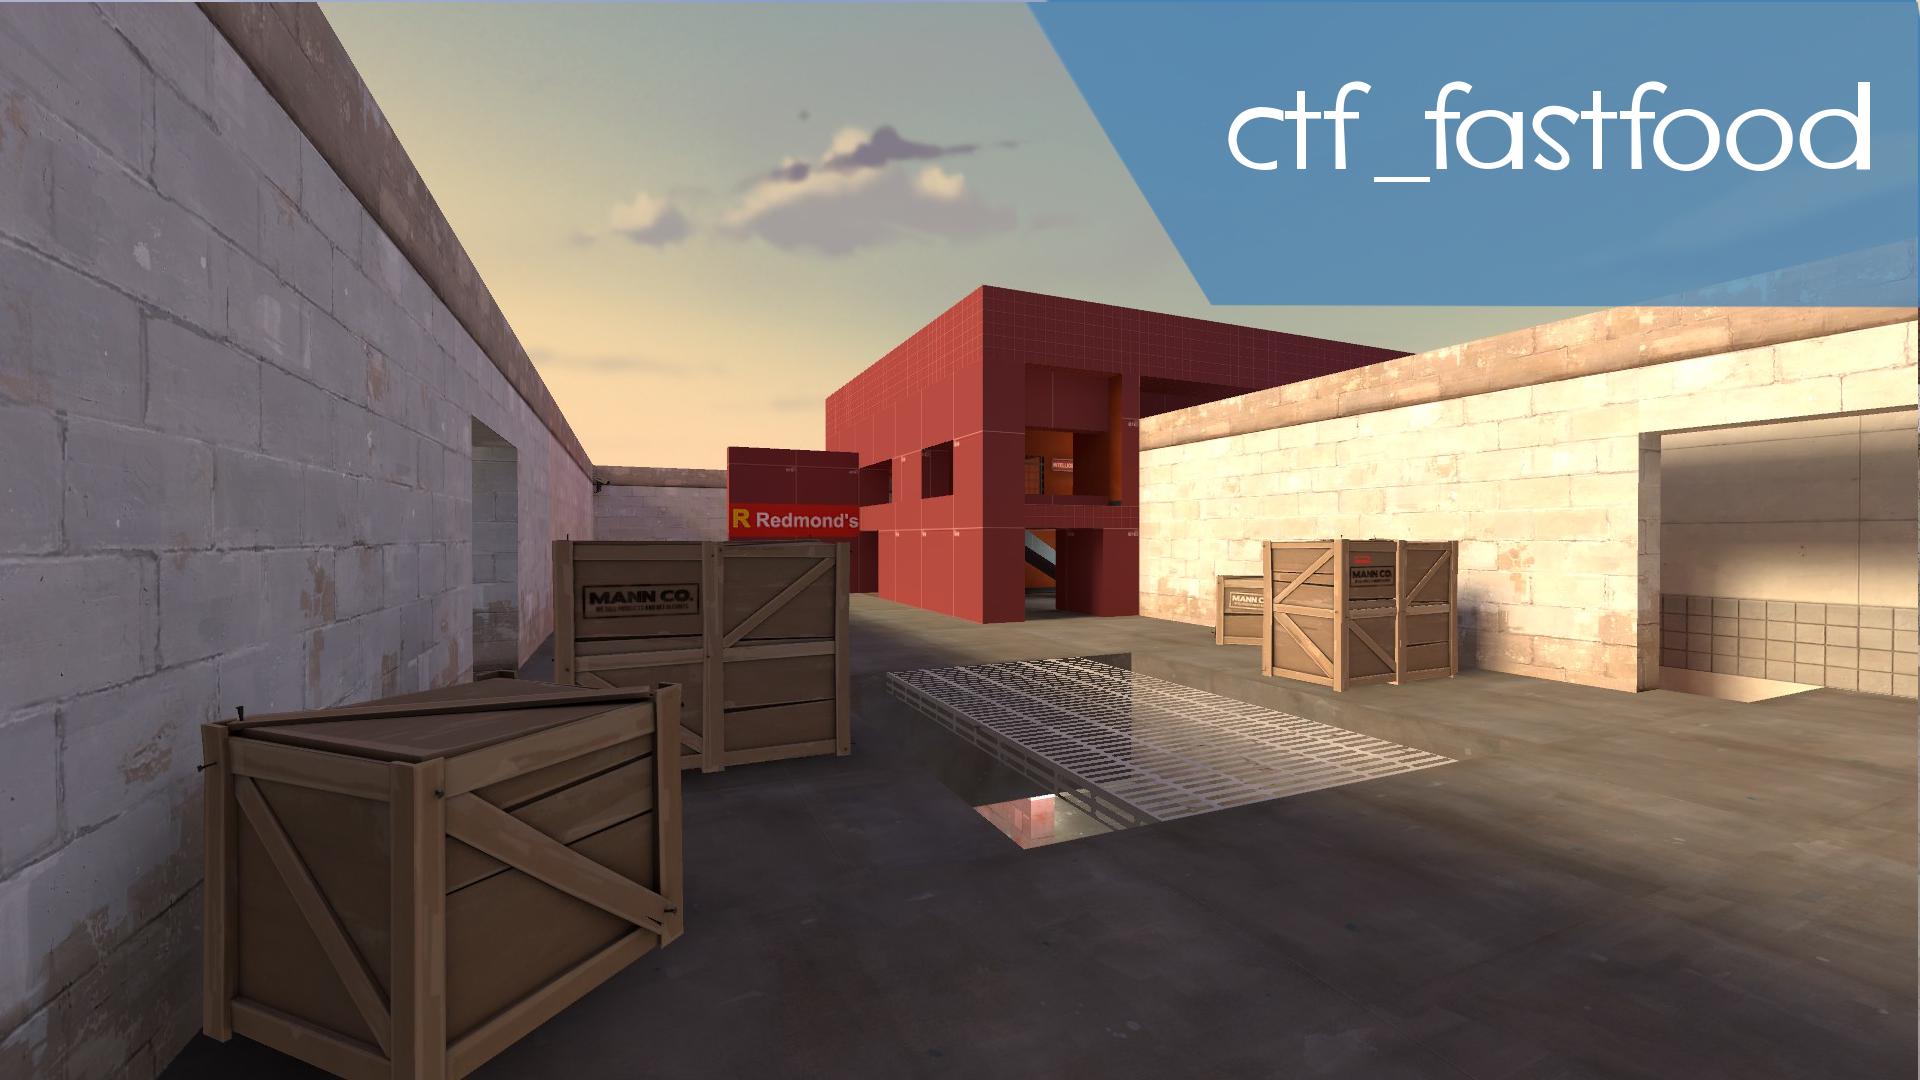 tf2_map_tumbnail_fastfood.png